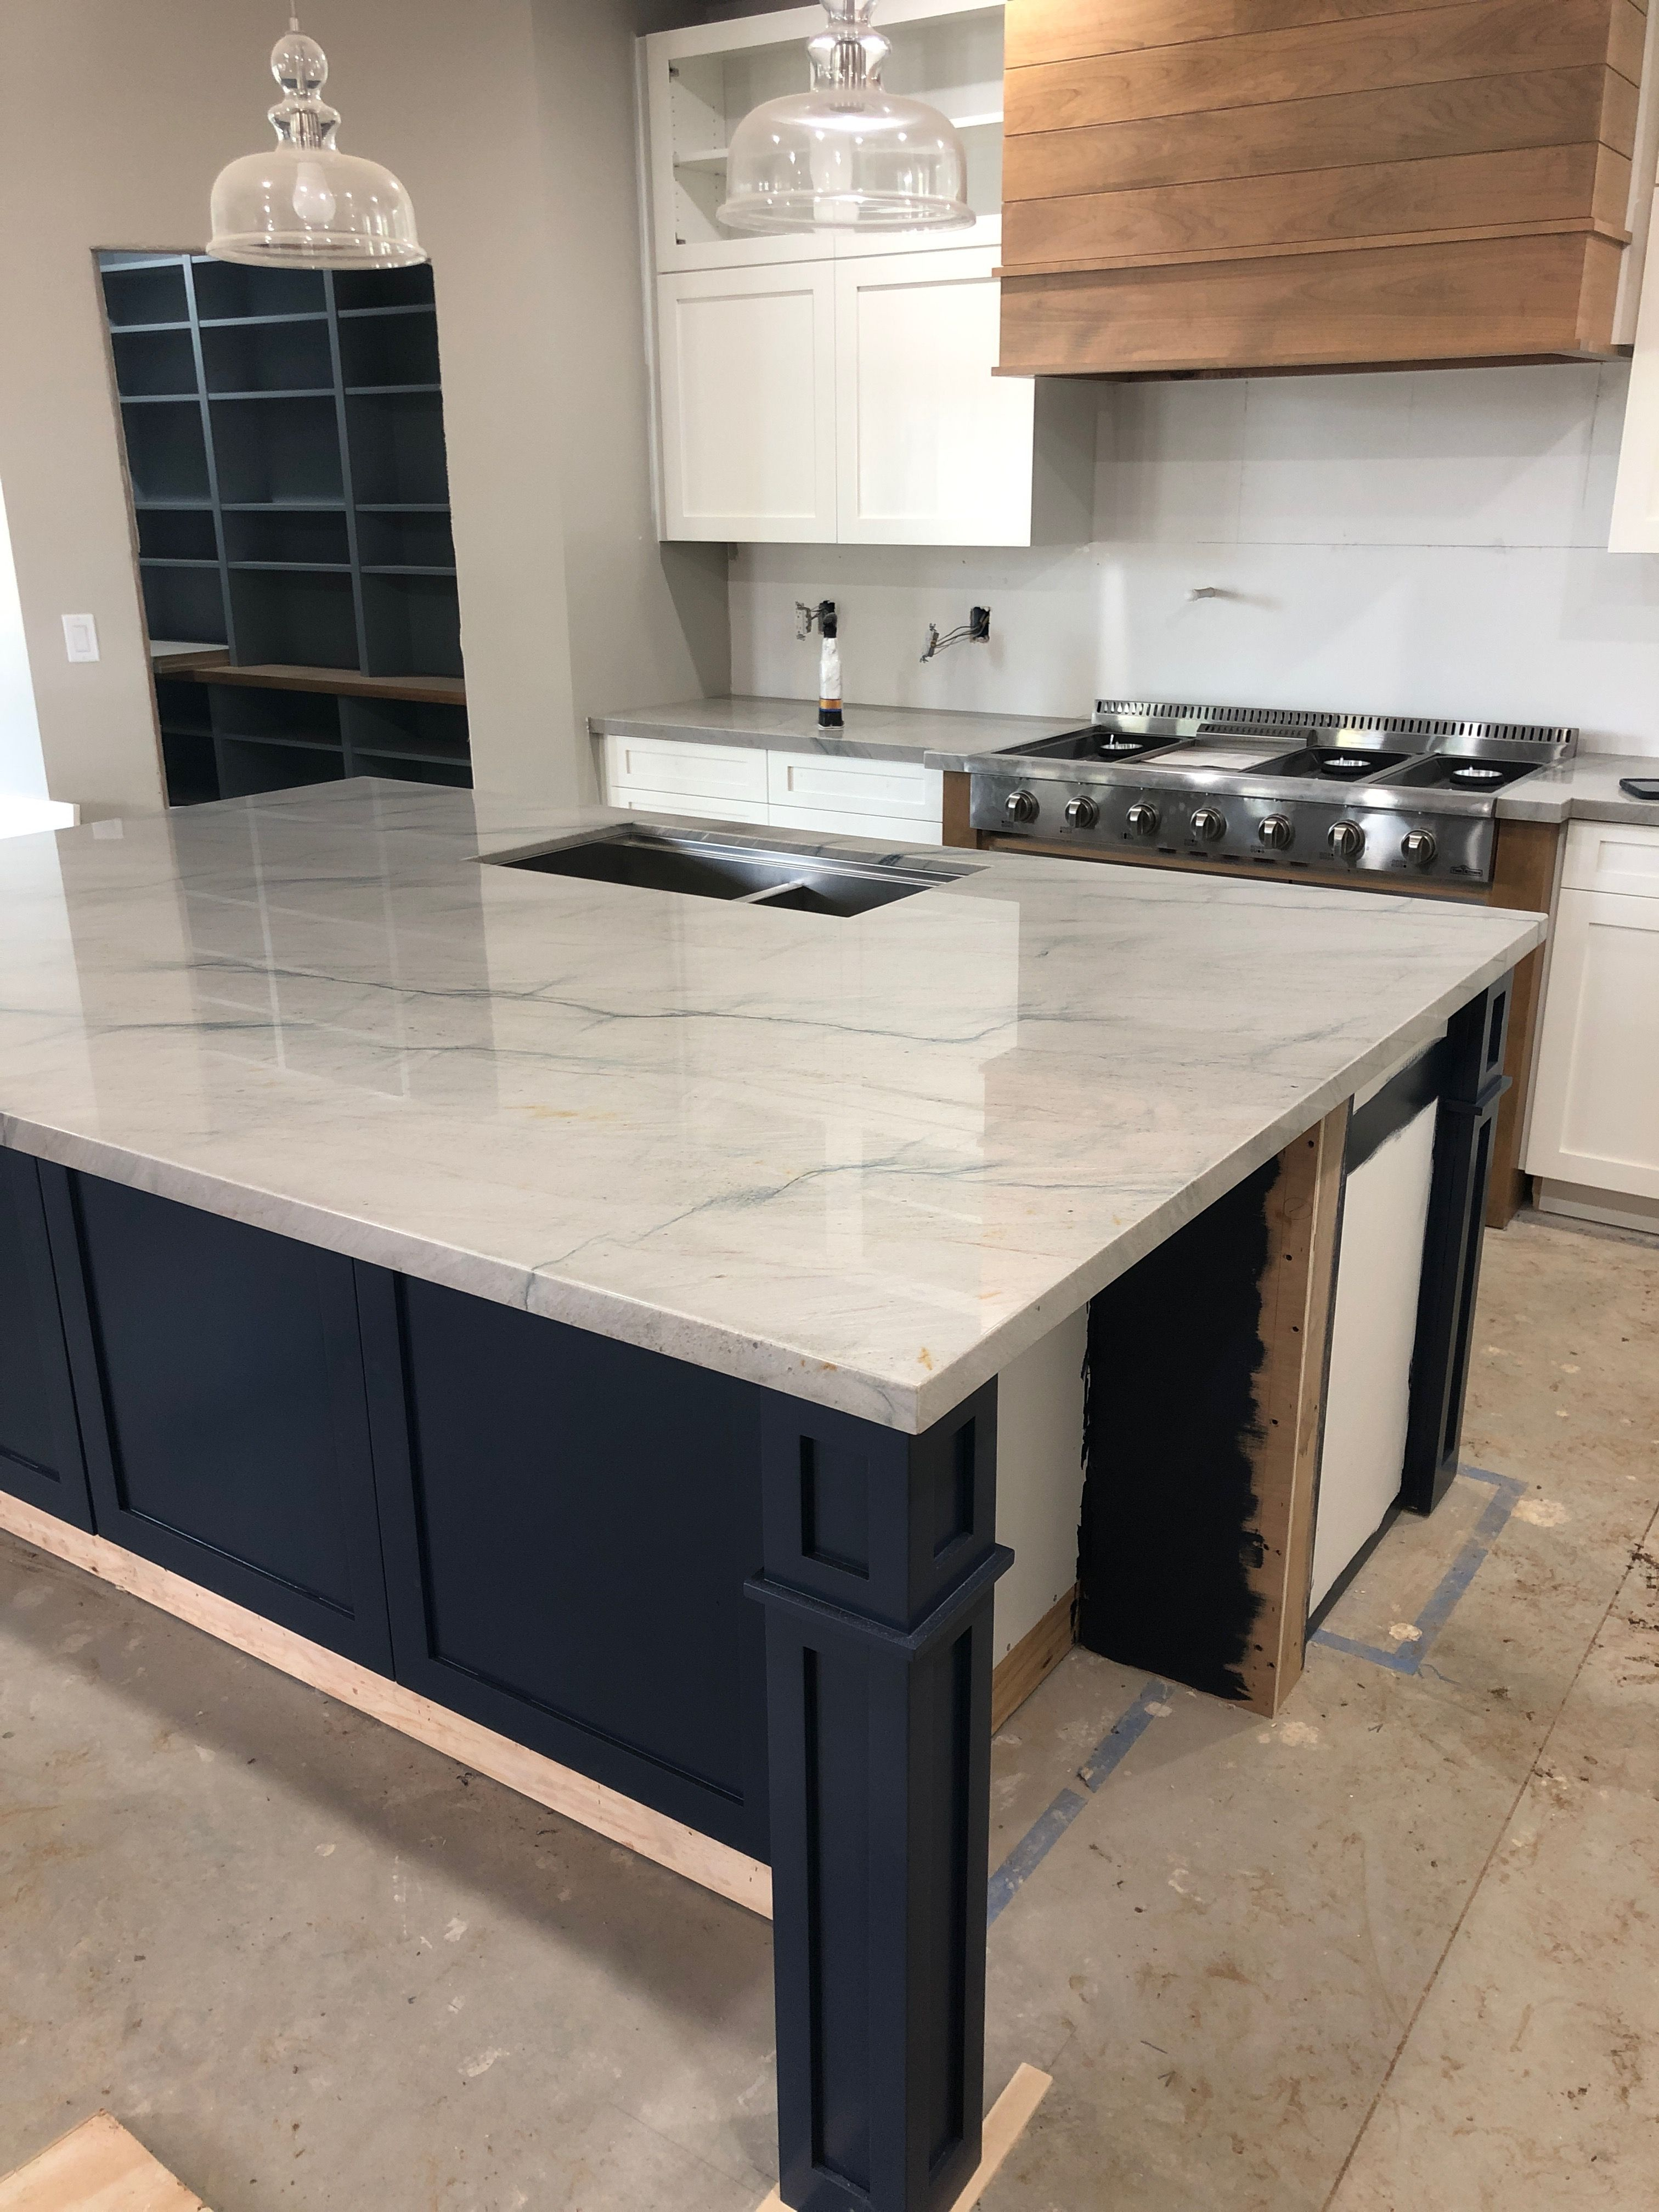 Meridian Quartzite I M In Love Gable Farms With Images Kitchen Design Countertops Quartzite Countertops